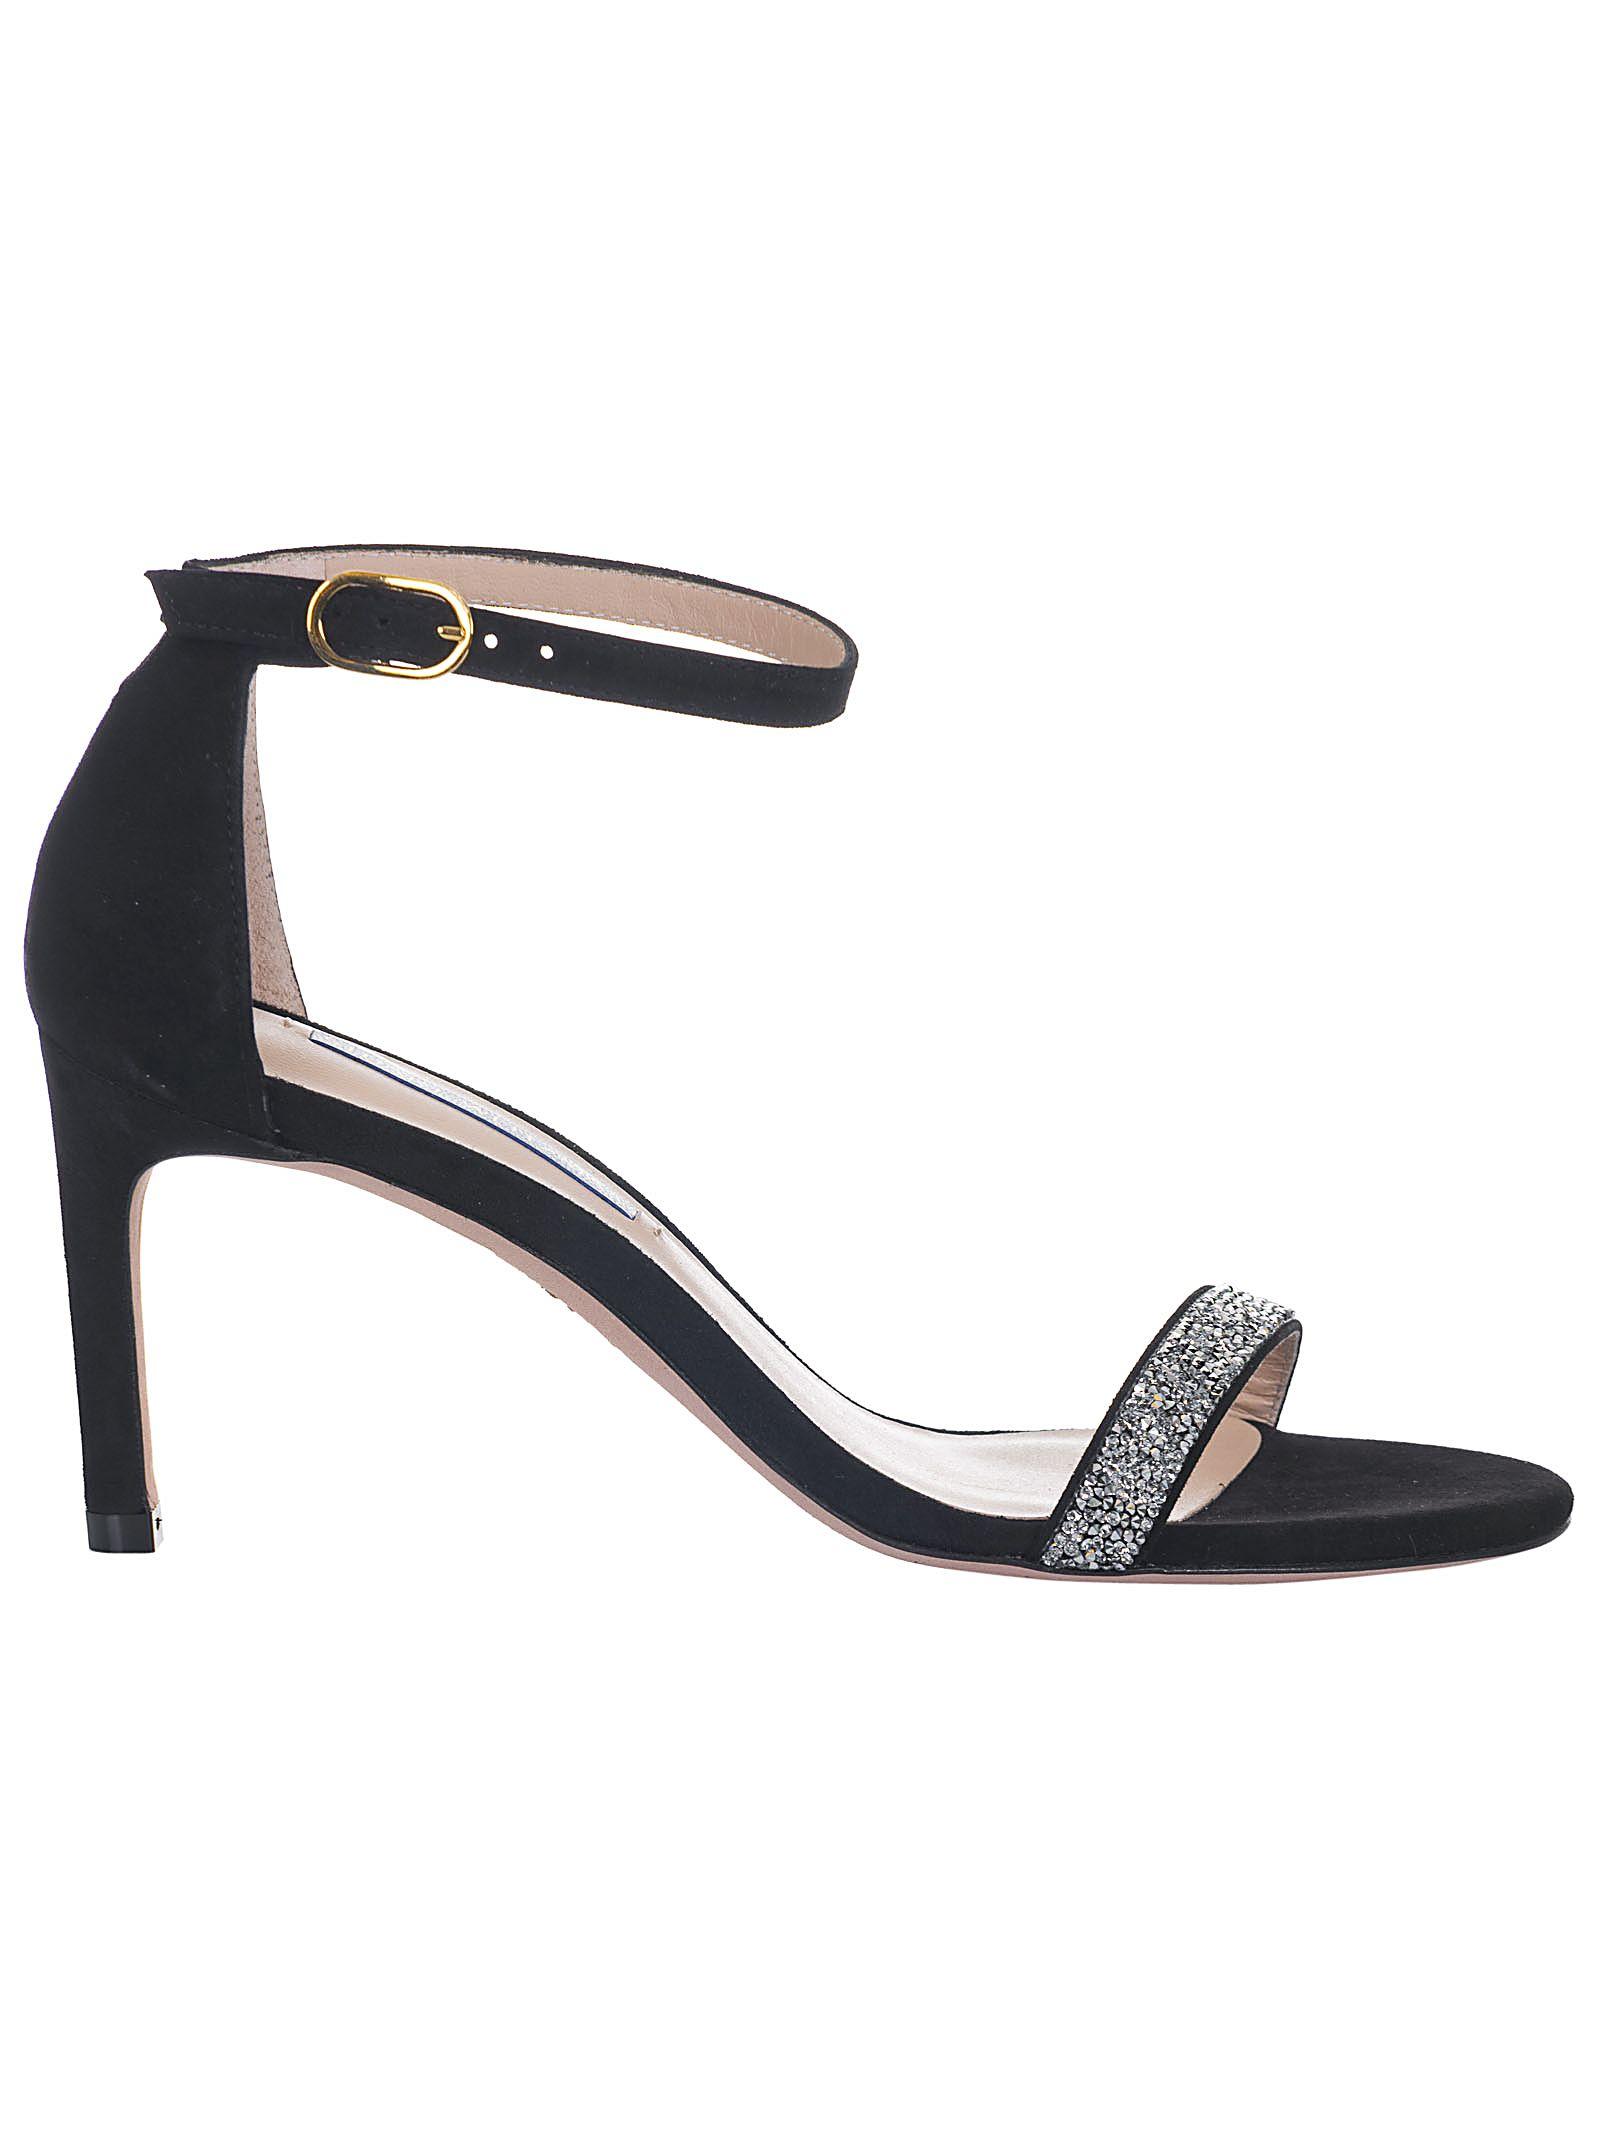 f56b20c06 Stuart Weitzman Stuart Weitzman Crystal Embellished Sandals - Black ...